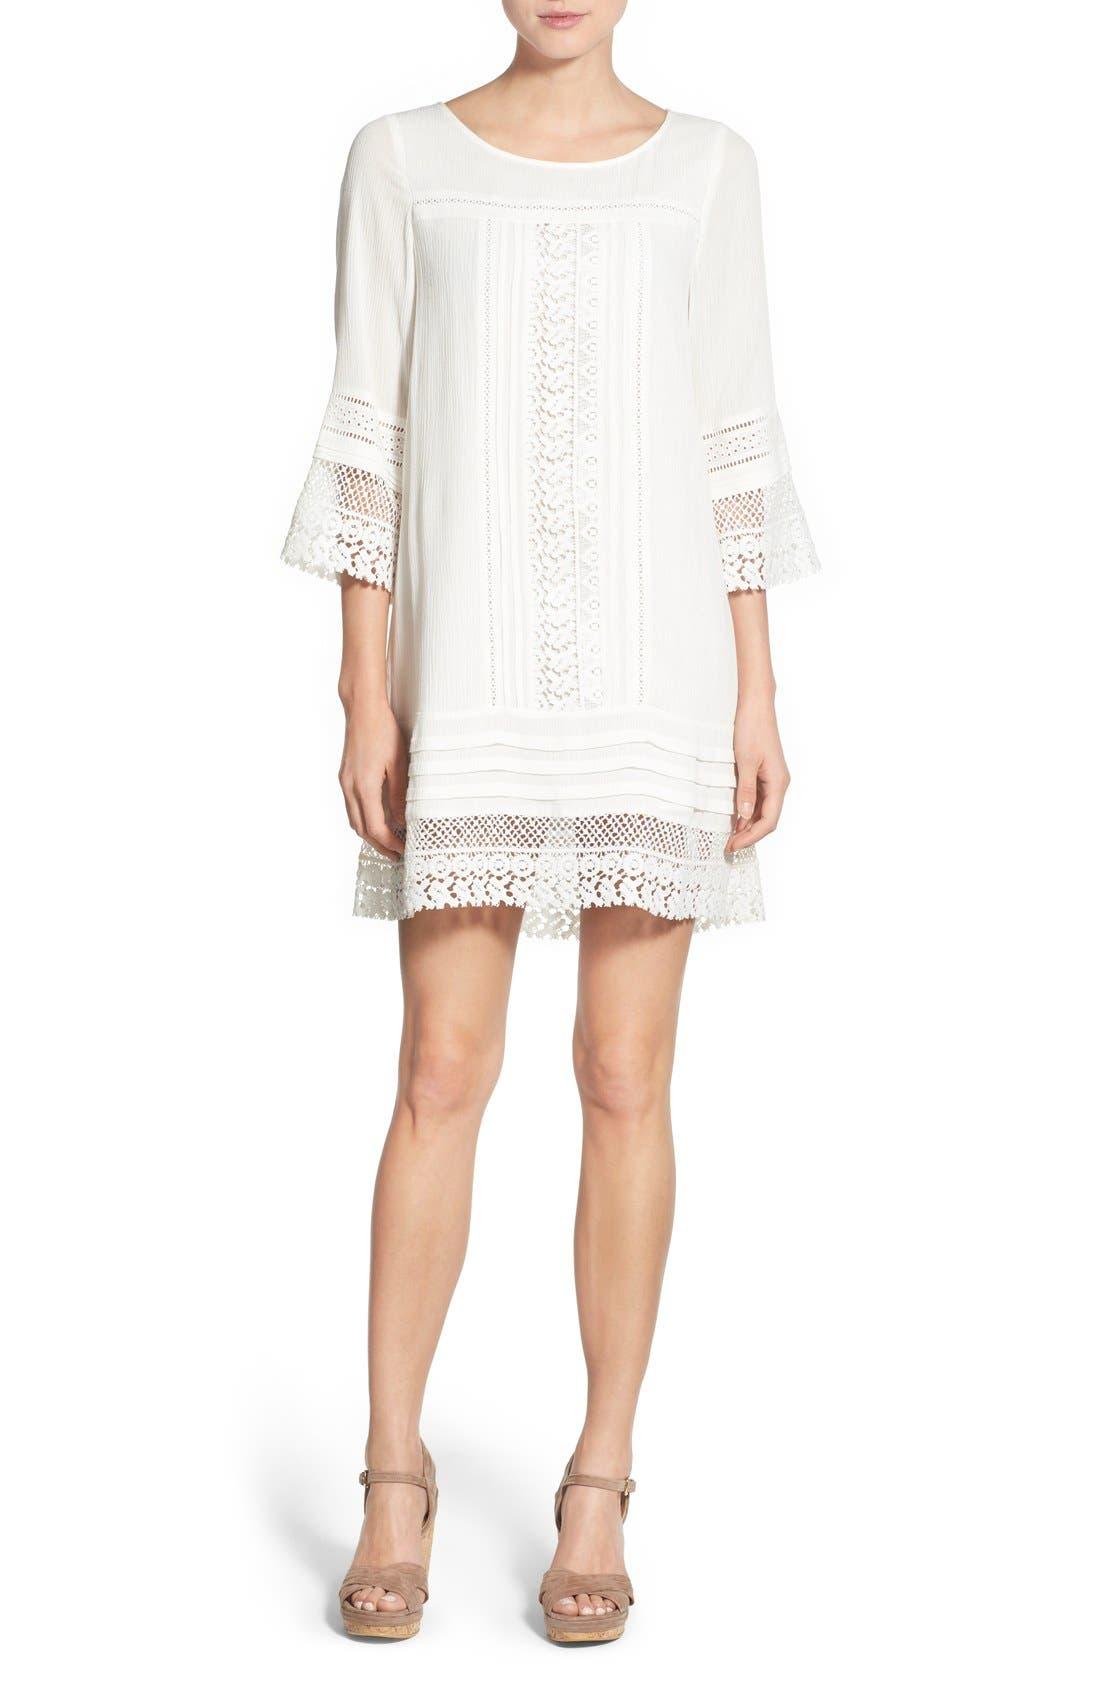 Alternate Image 1 Selected - Sanctuary 'Desert Boheme' Lace Trim Shift Dress